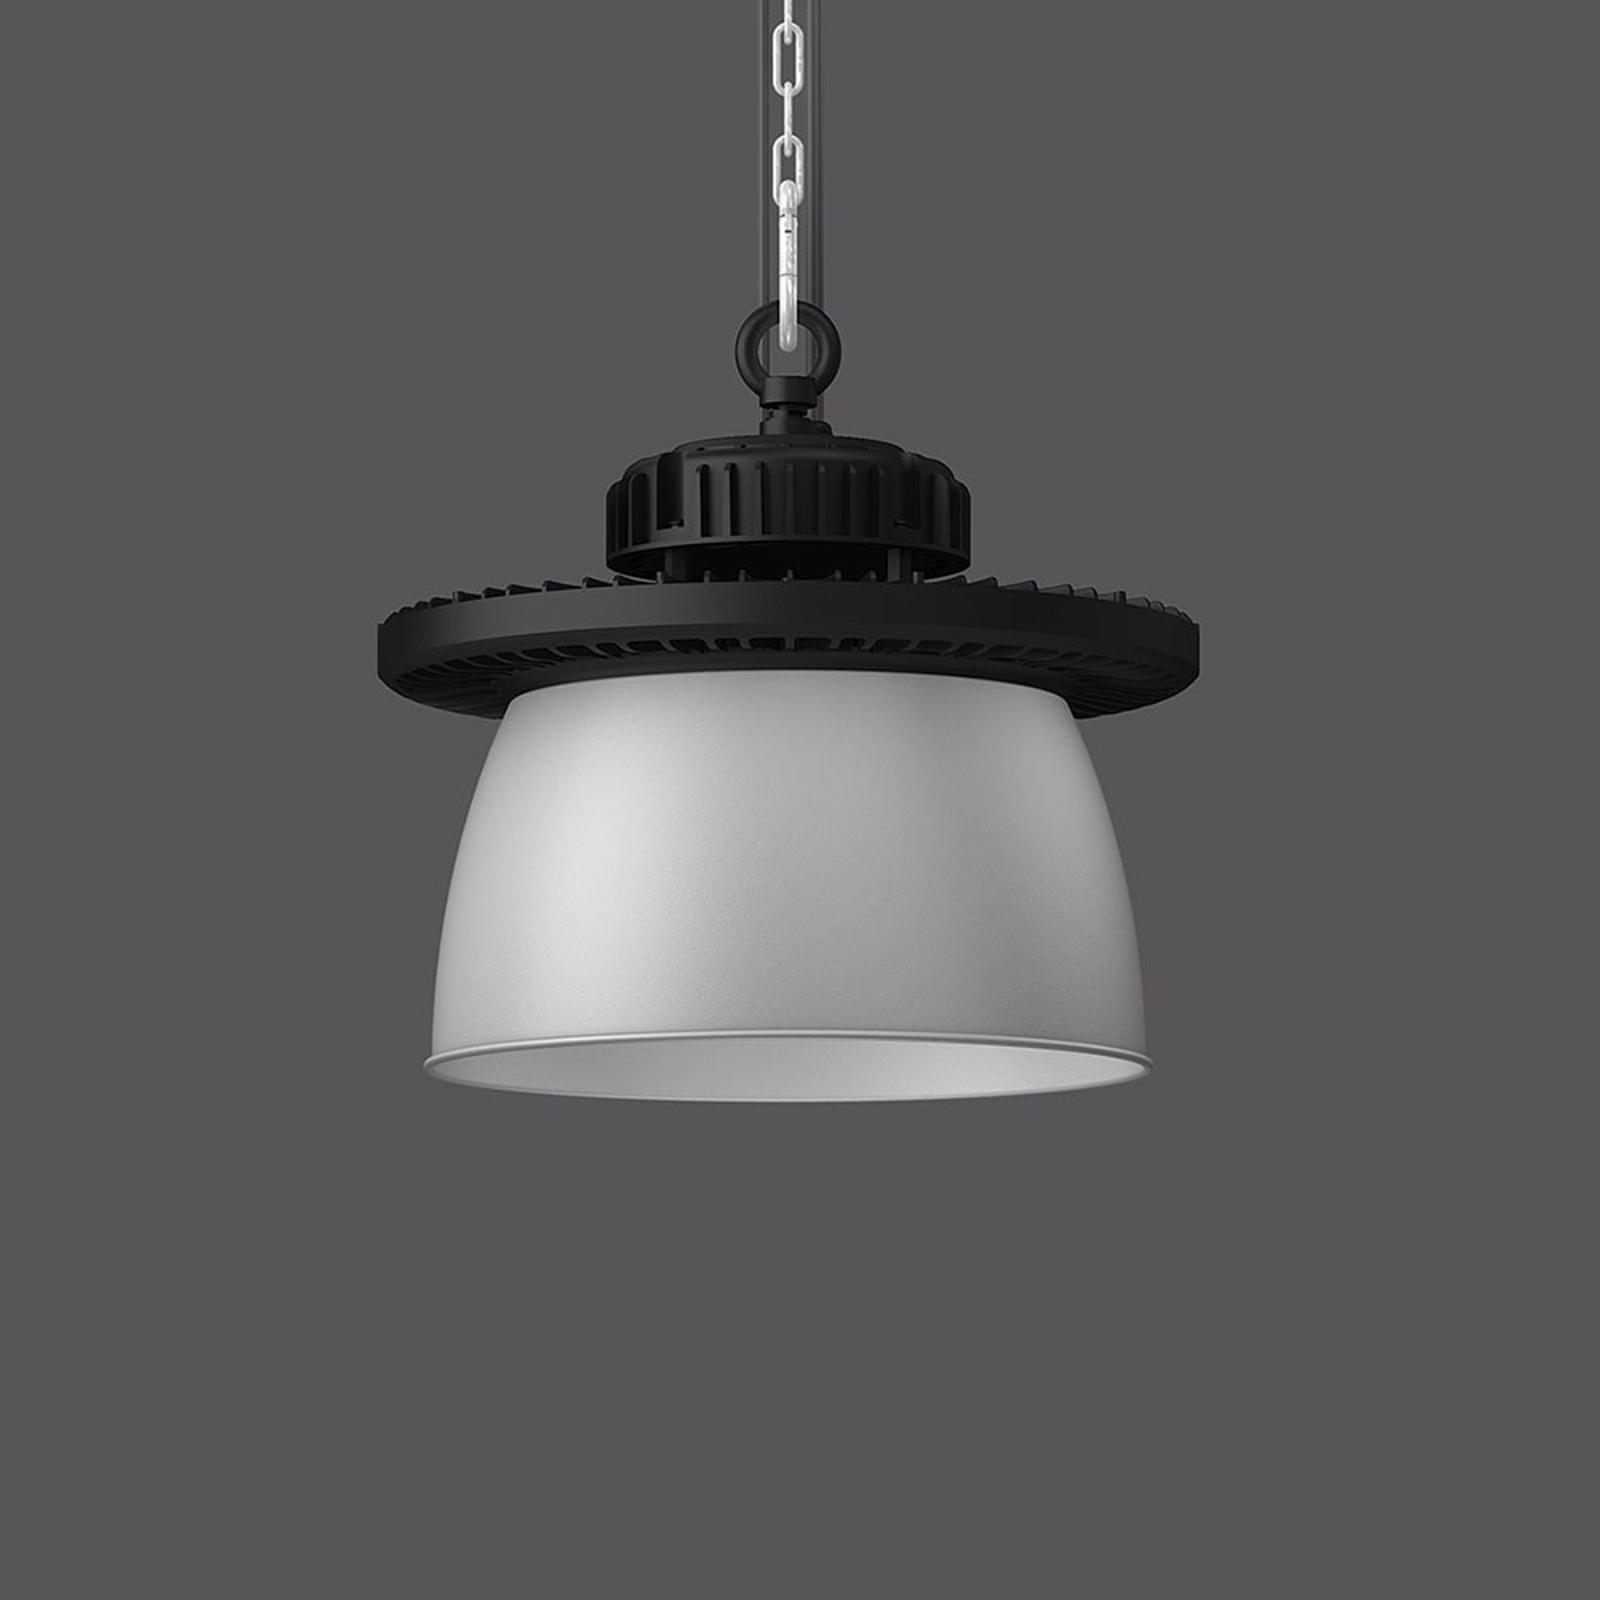 RZB Industrial Hall Maxi DALI 251 W Reflektor ALU